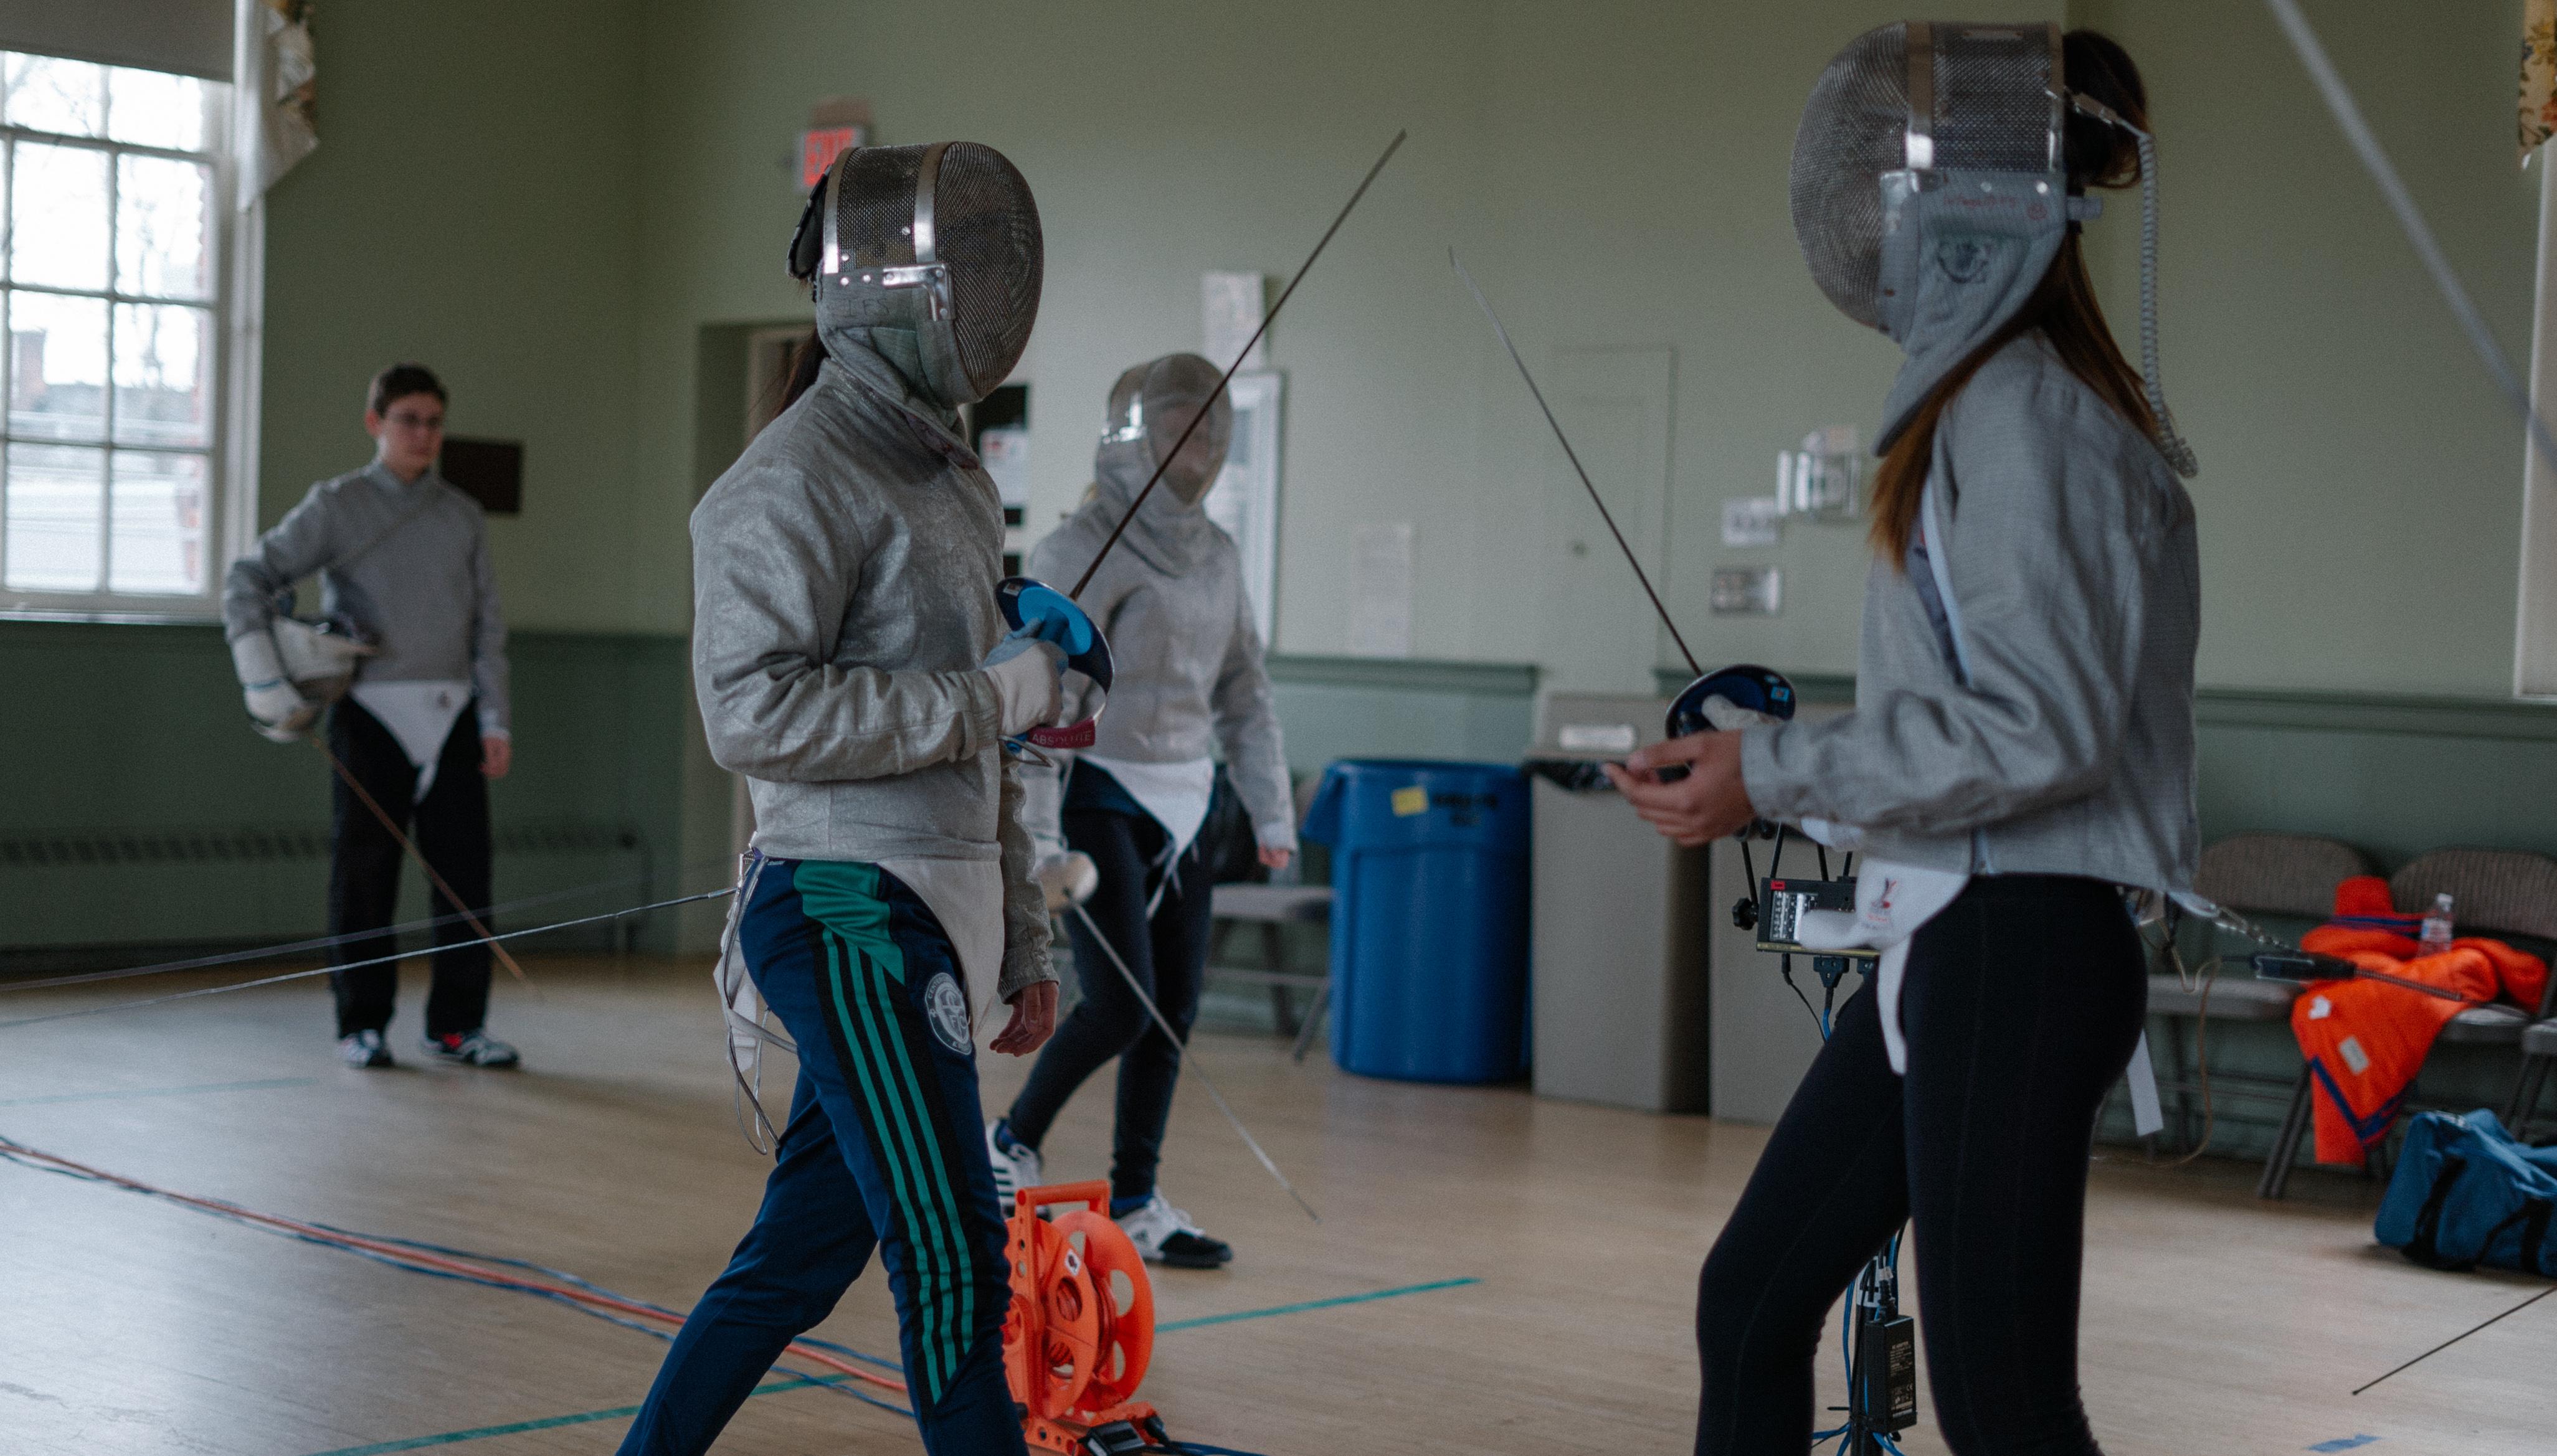 fencing-54.jpg